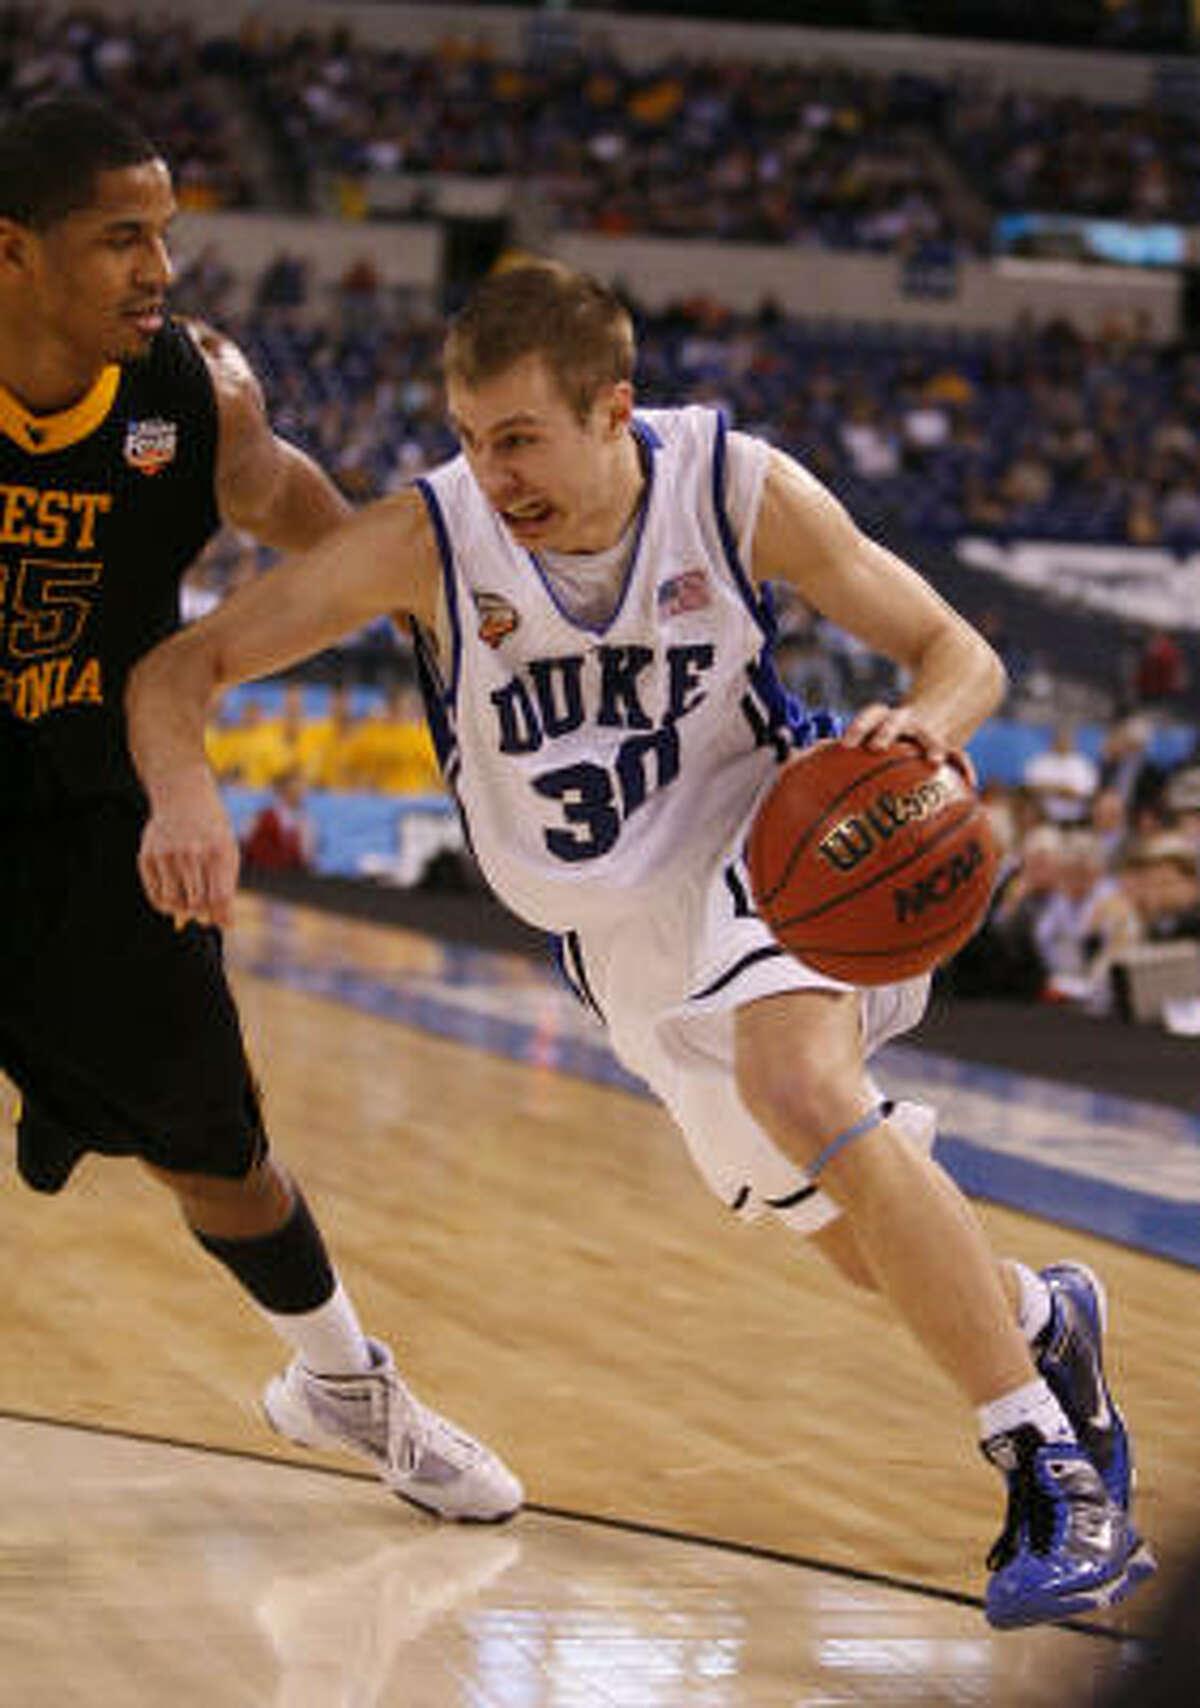 Duke guard Jon Scheyer drives around West Virginia forward Wellington Smith during the second half.